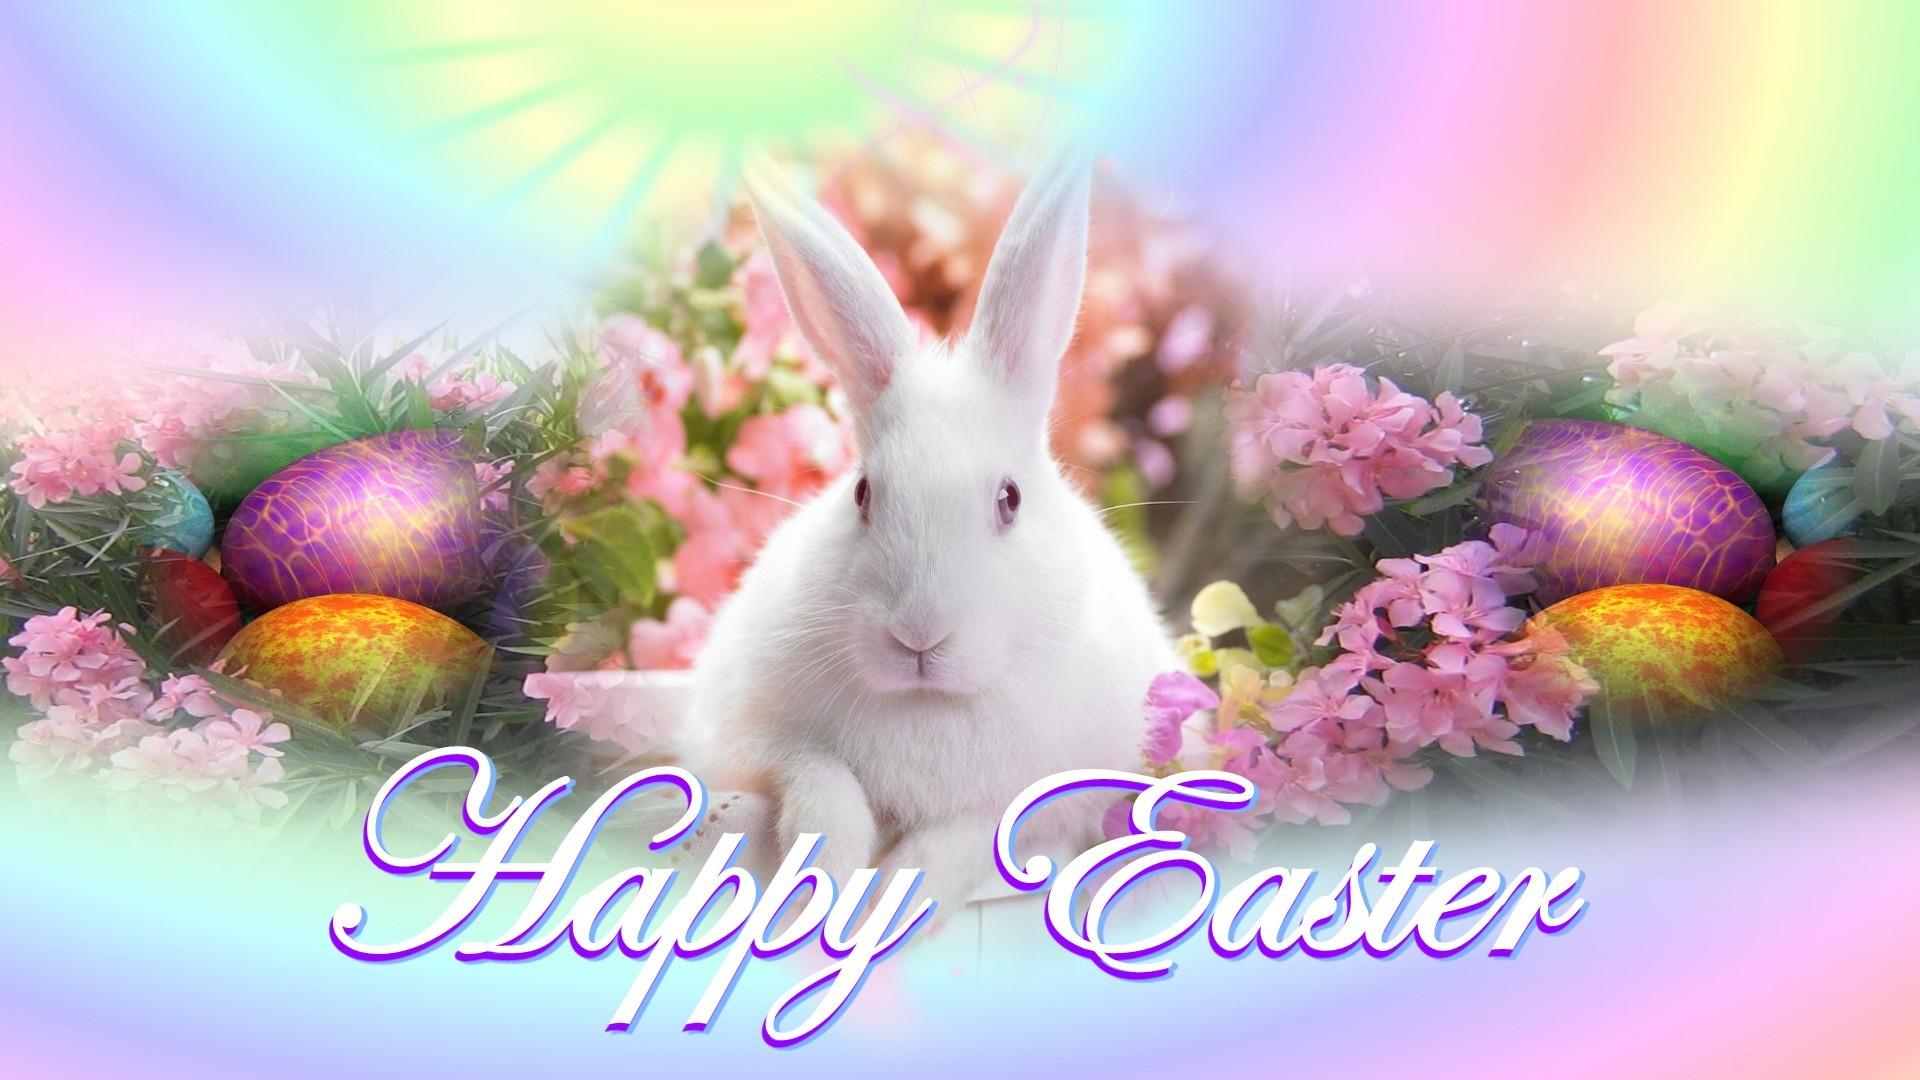 Happy Easter Bunny 2013 1920x1080